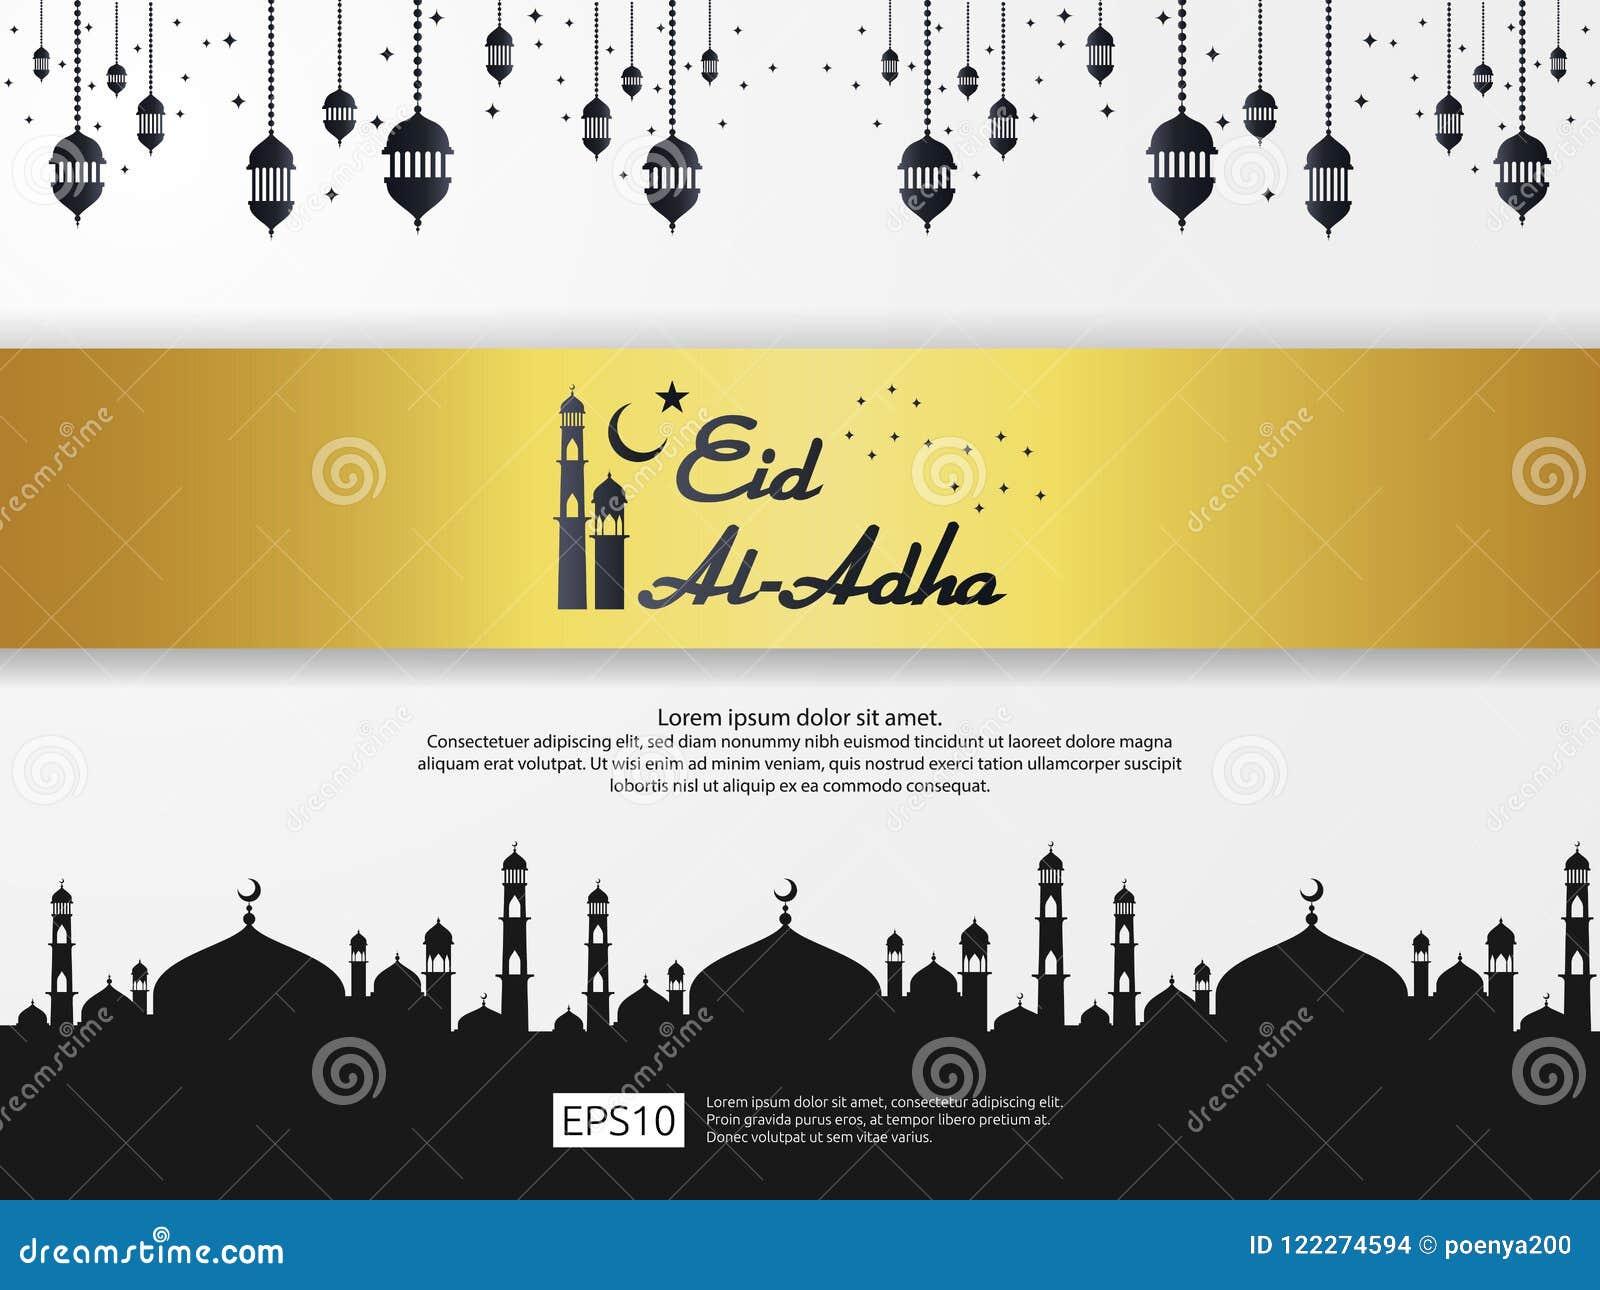 Eid Al Adha Mubarak Islamic Greeting Card Design With Dome